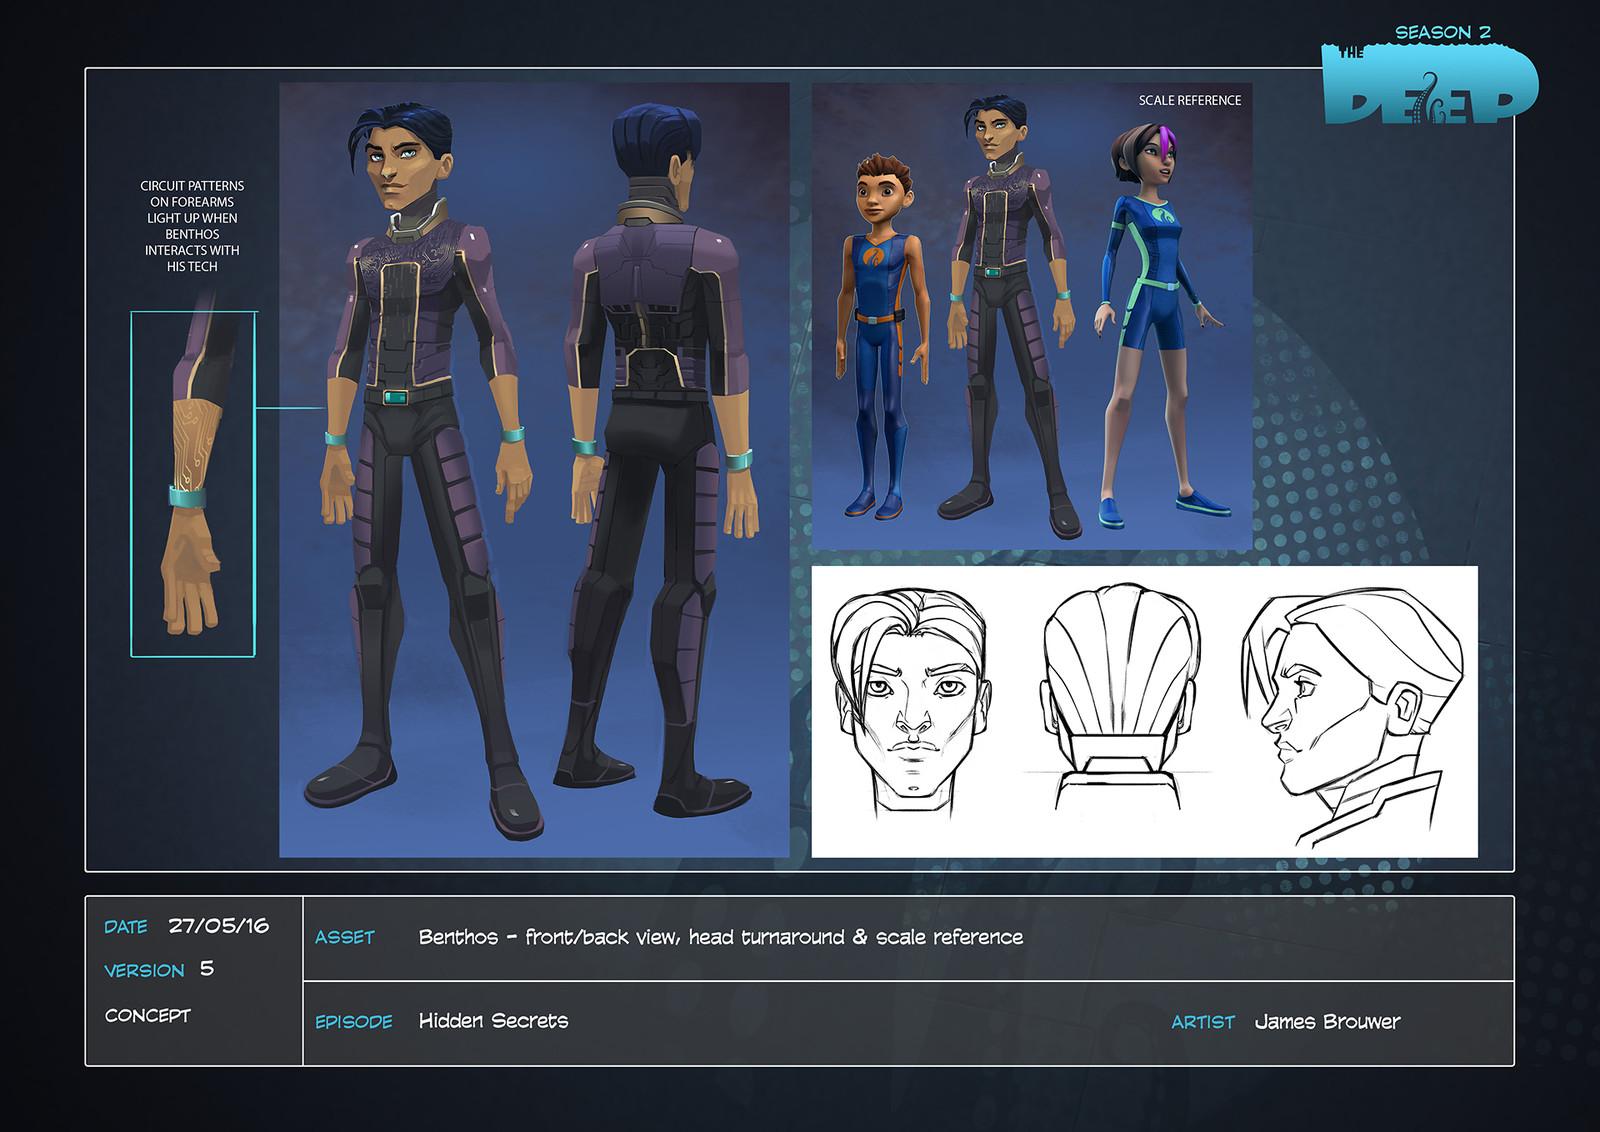 Final character design for Season 2 villain Alpheus Benthos.